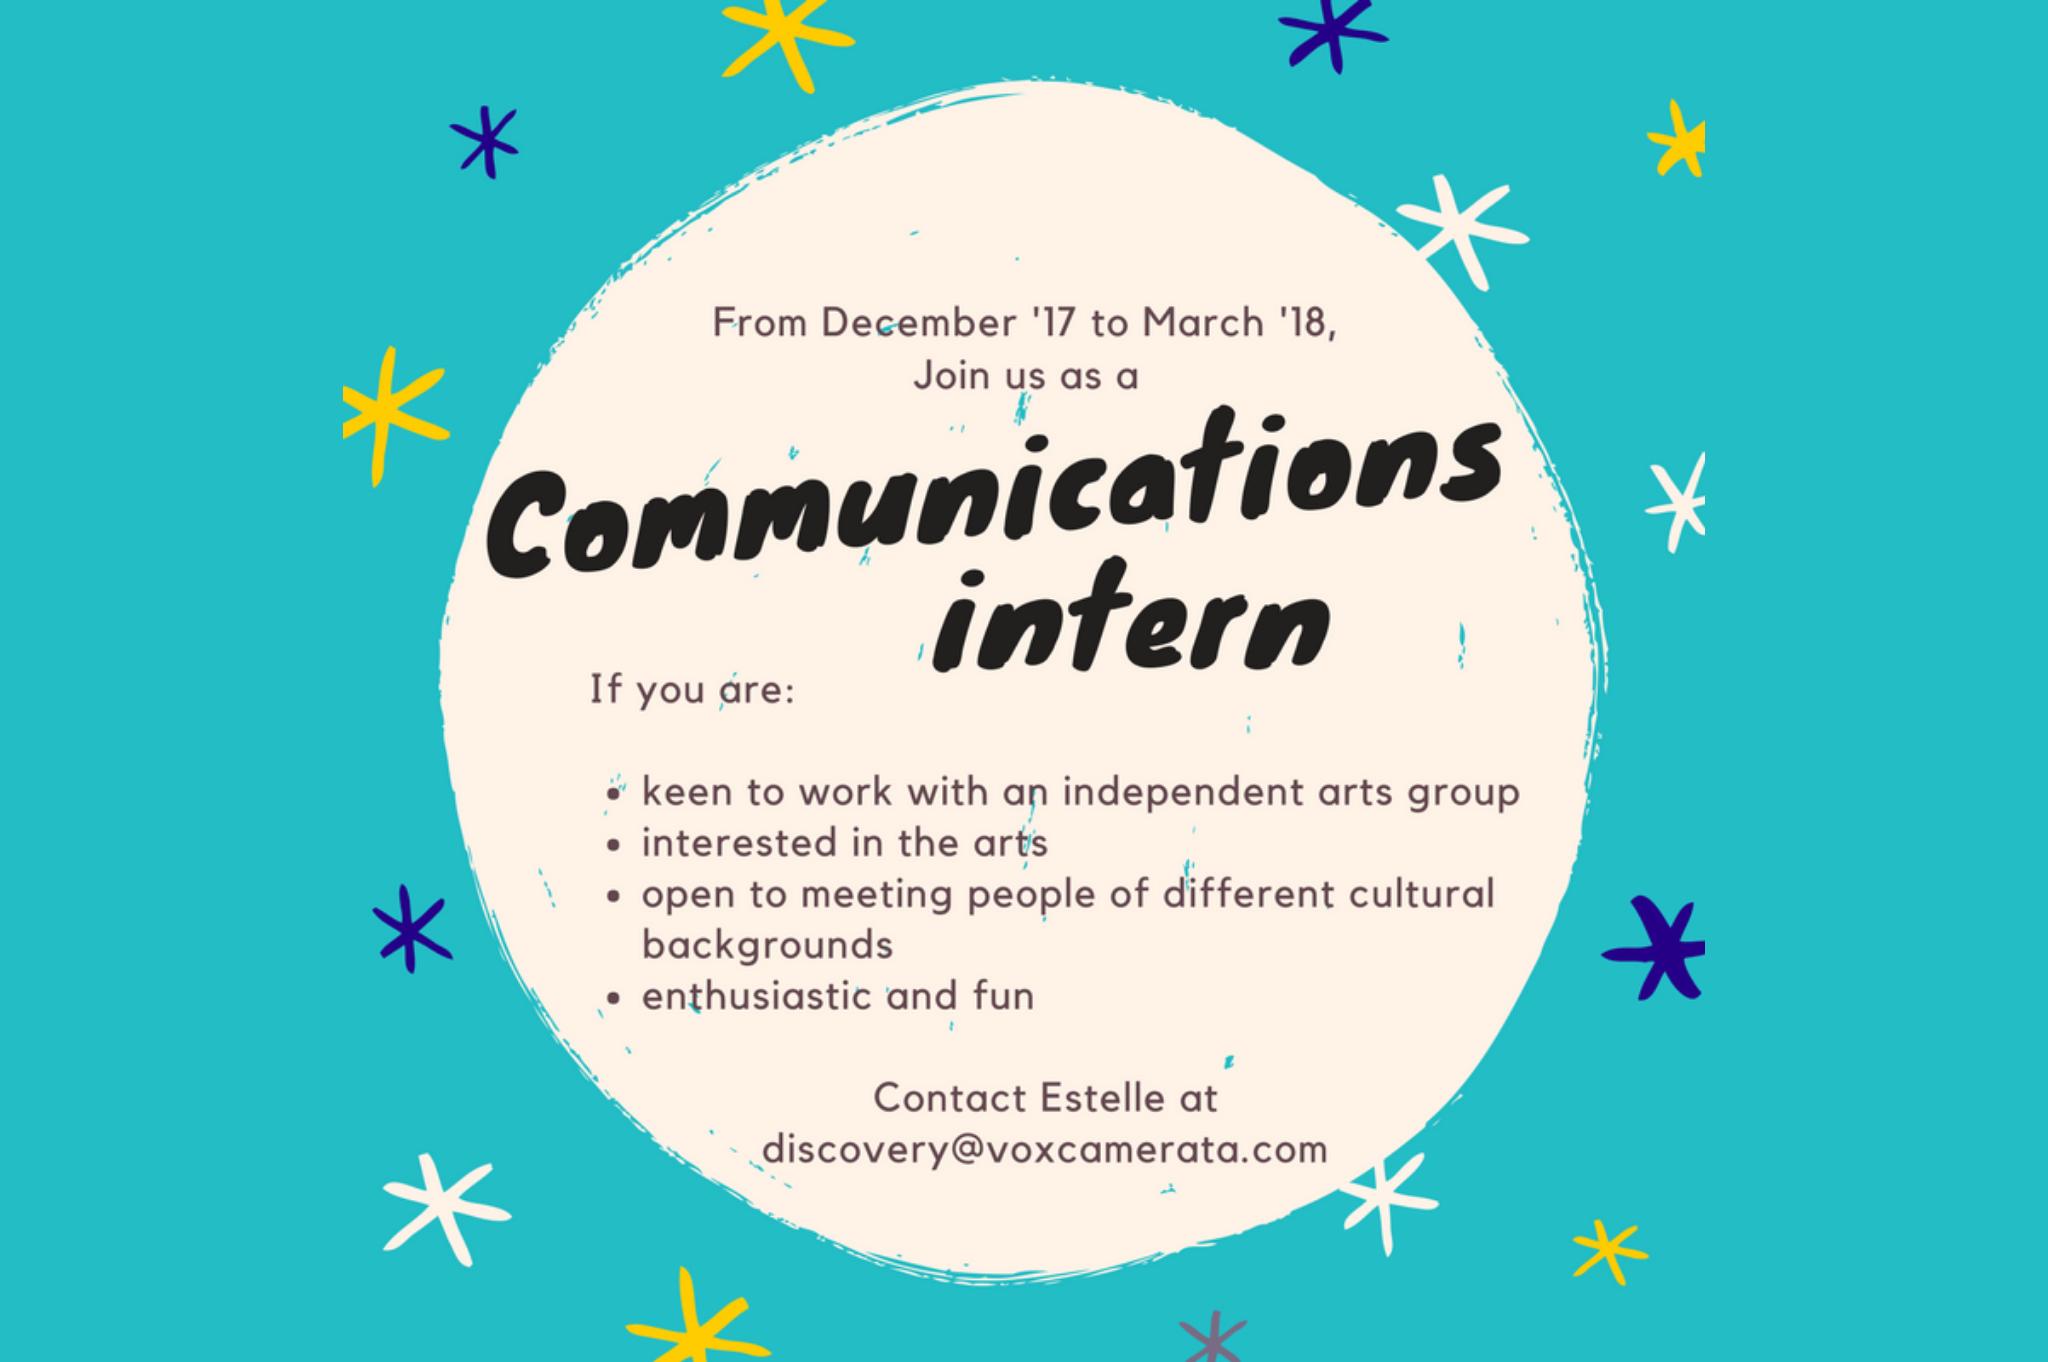 Communications intern wanted!